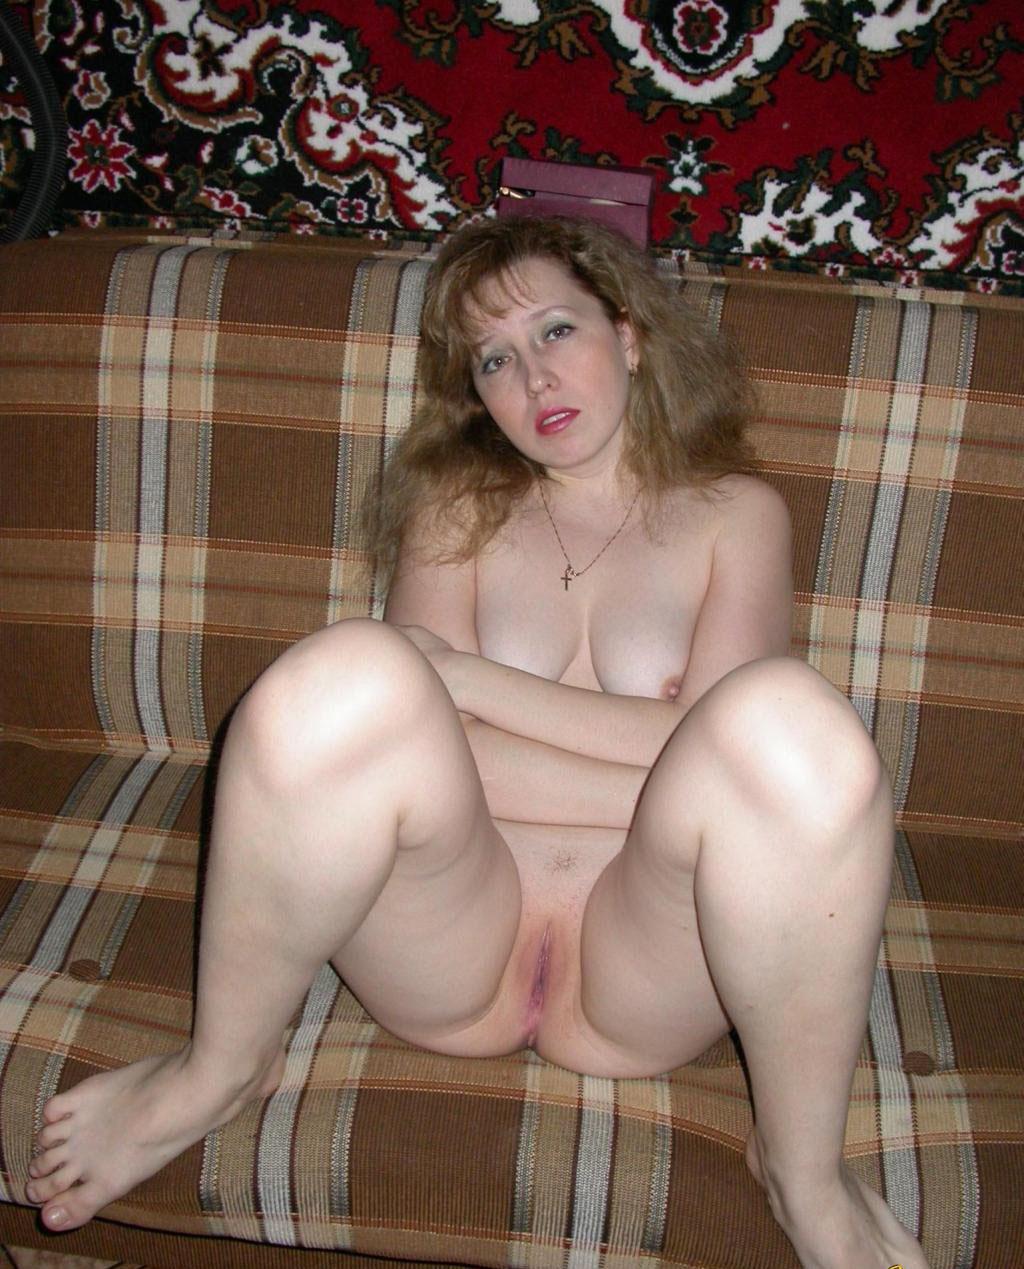 hairy wife sleeping nude